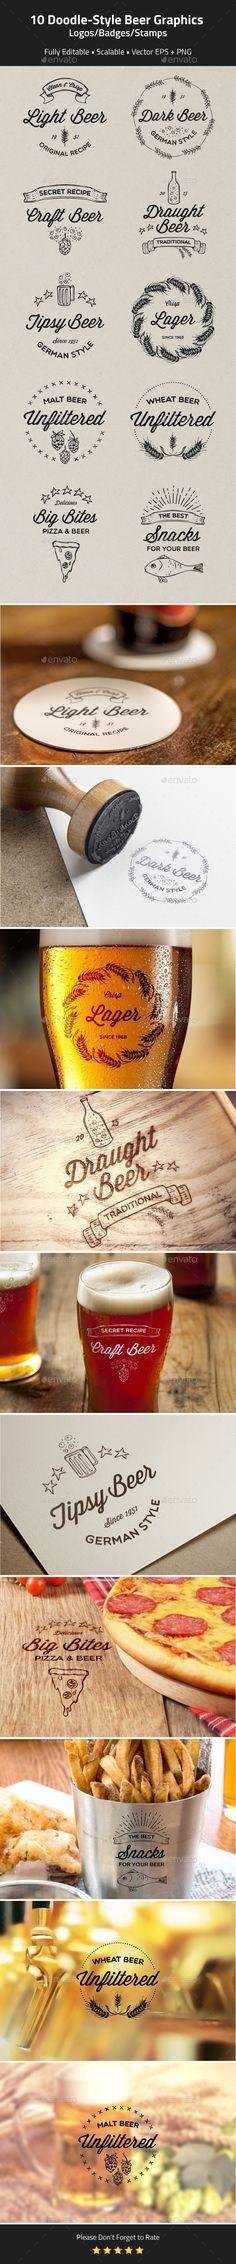 10 Doodle-Style Beer logos, badges, stamps #design Download: http://graphicriver.net/item/10-doodlestyle-beer-logos-badges-stamps/13834329?ref=ksioks